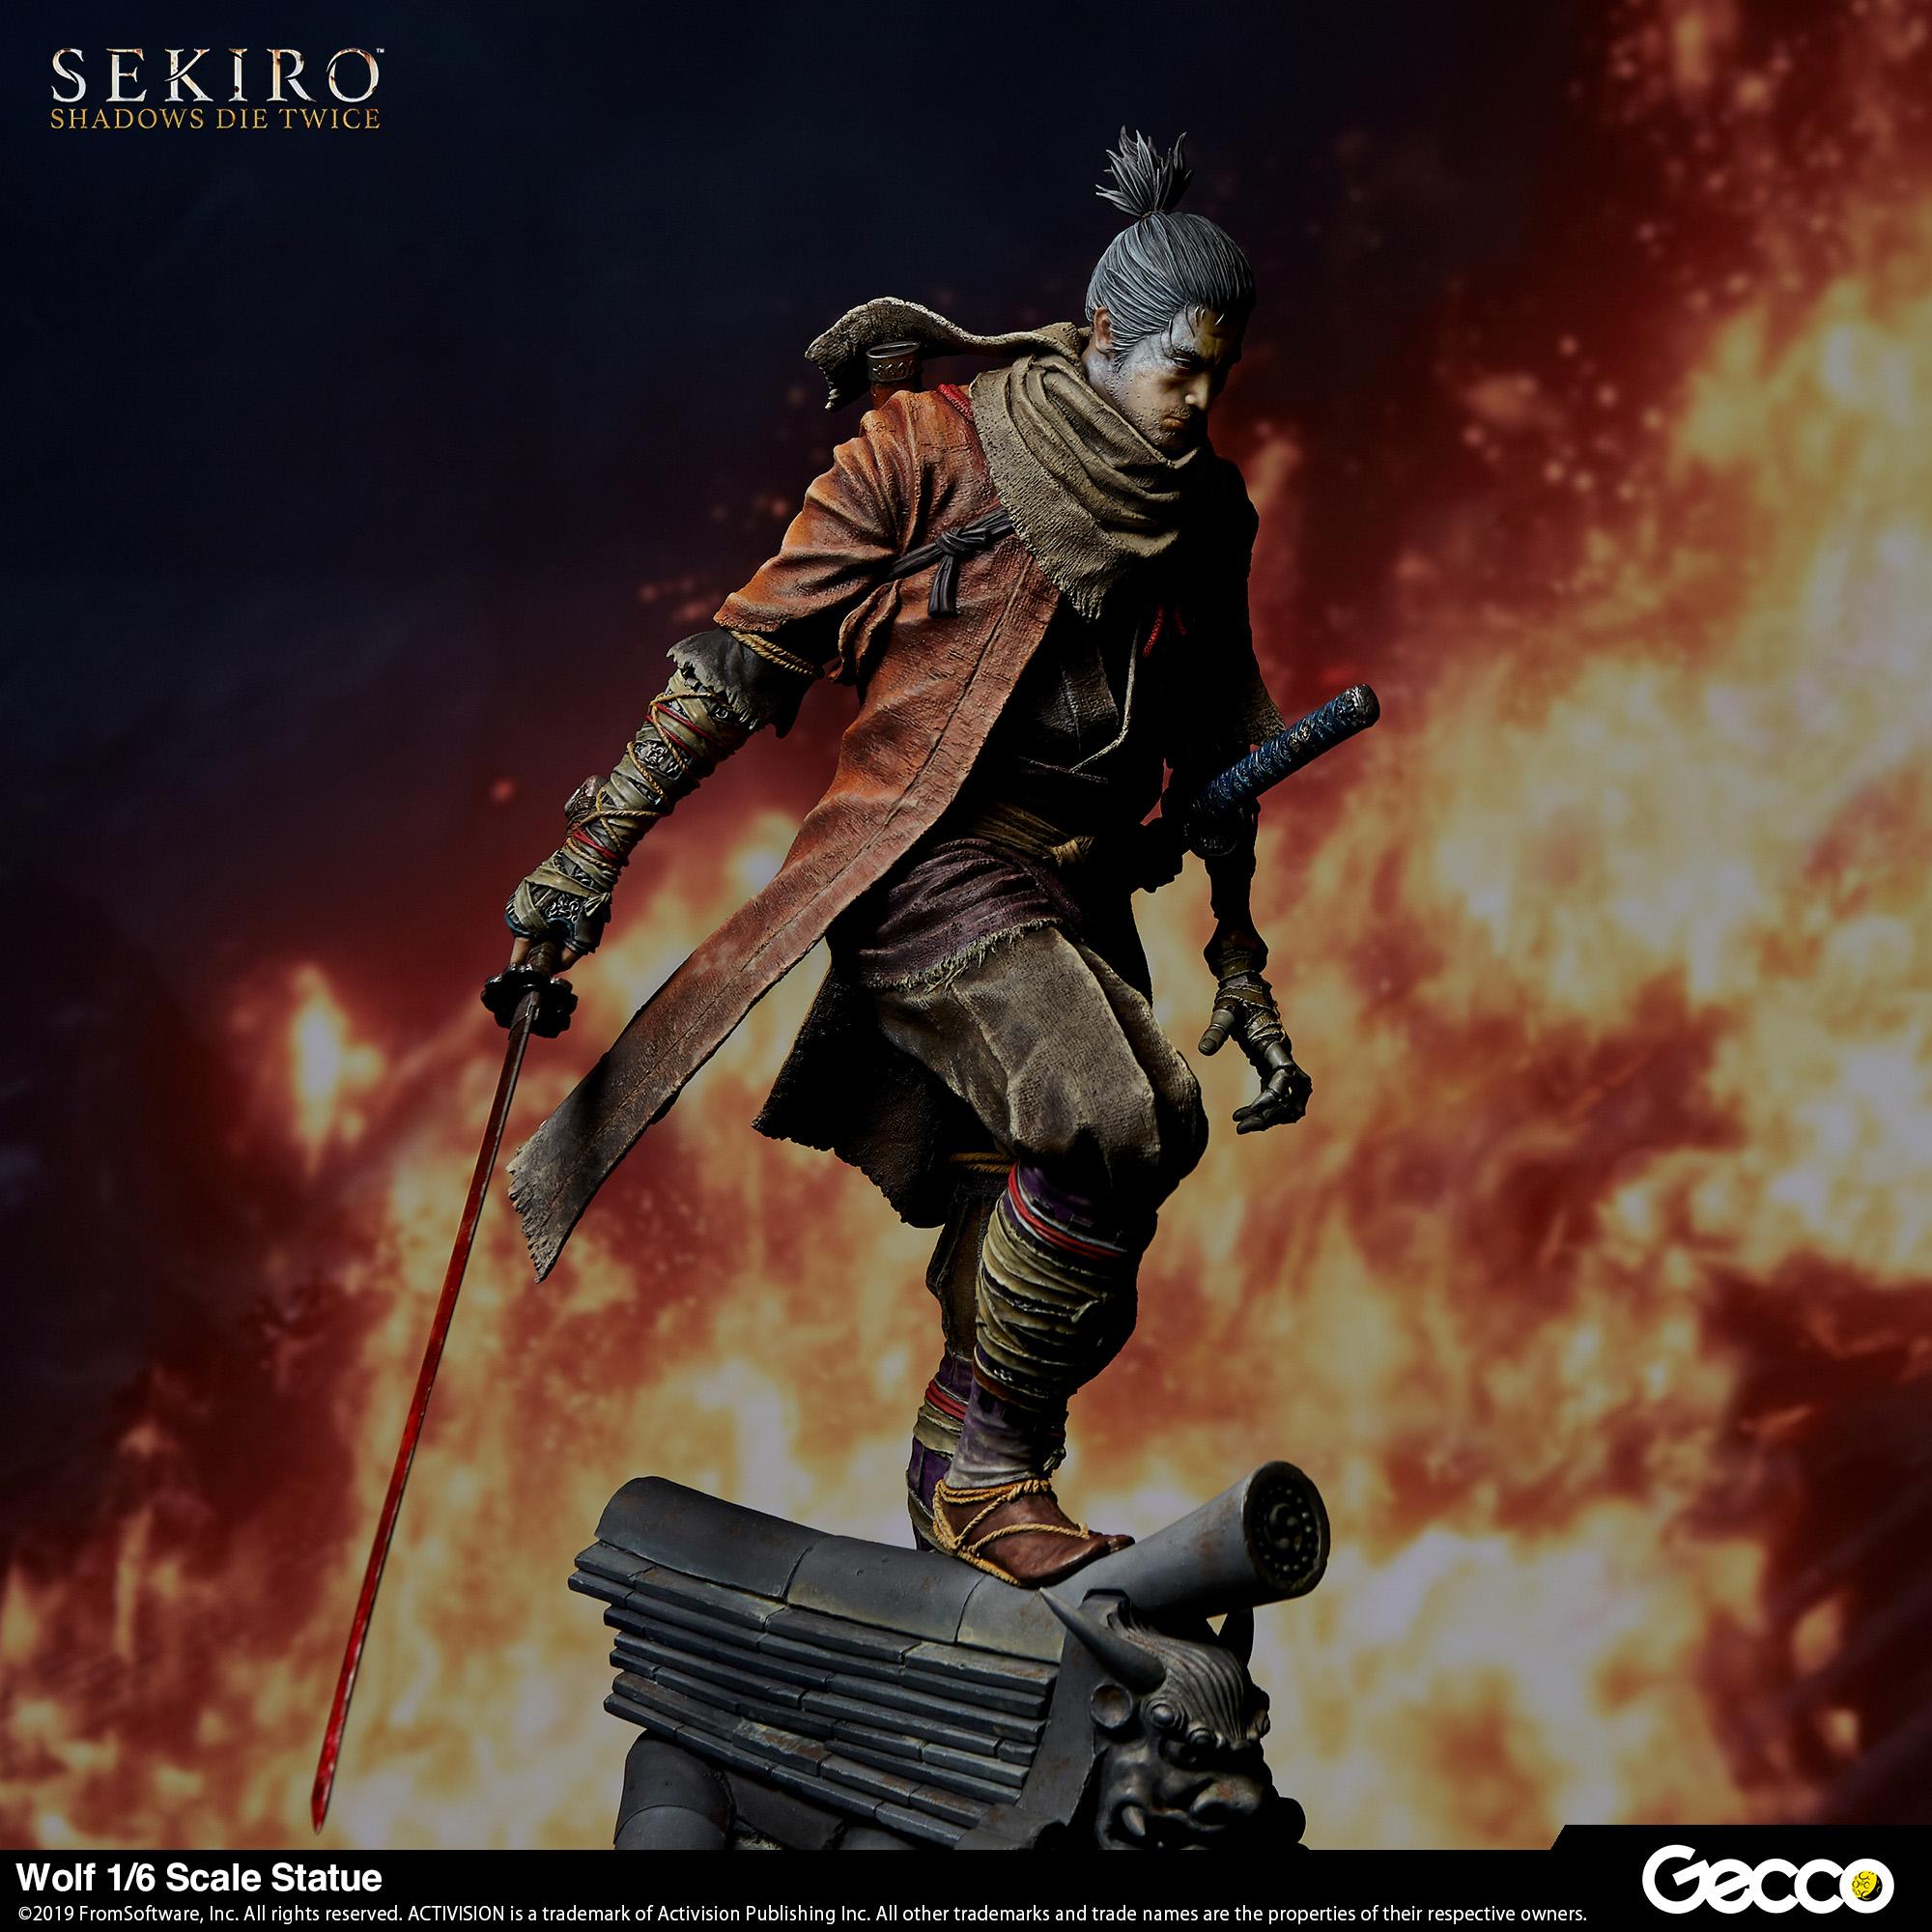 Link a Sekiro_Shadows_die_Twice_Wolf_Okami_Lupo_Statue_Figure_Gecco-1 (4)